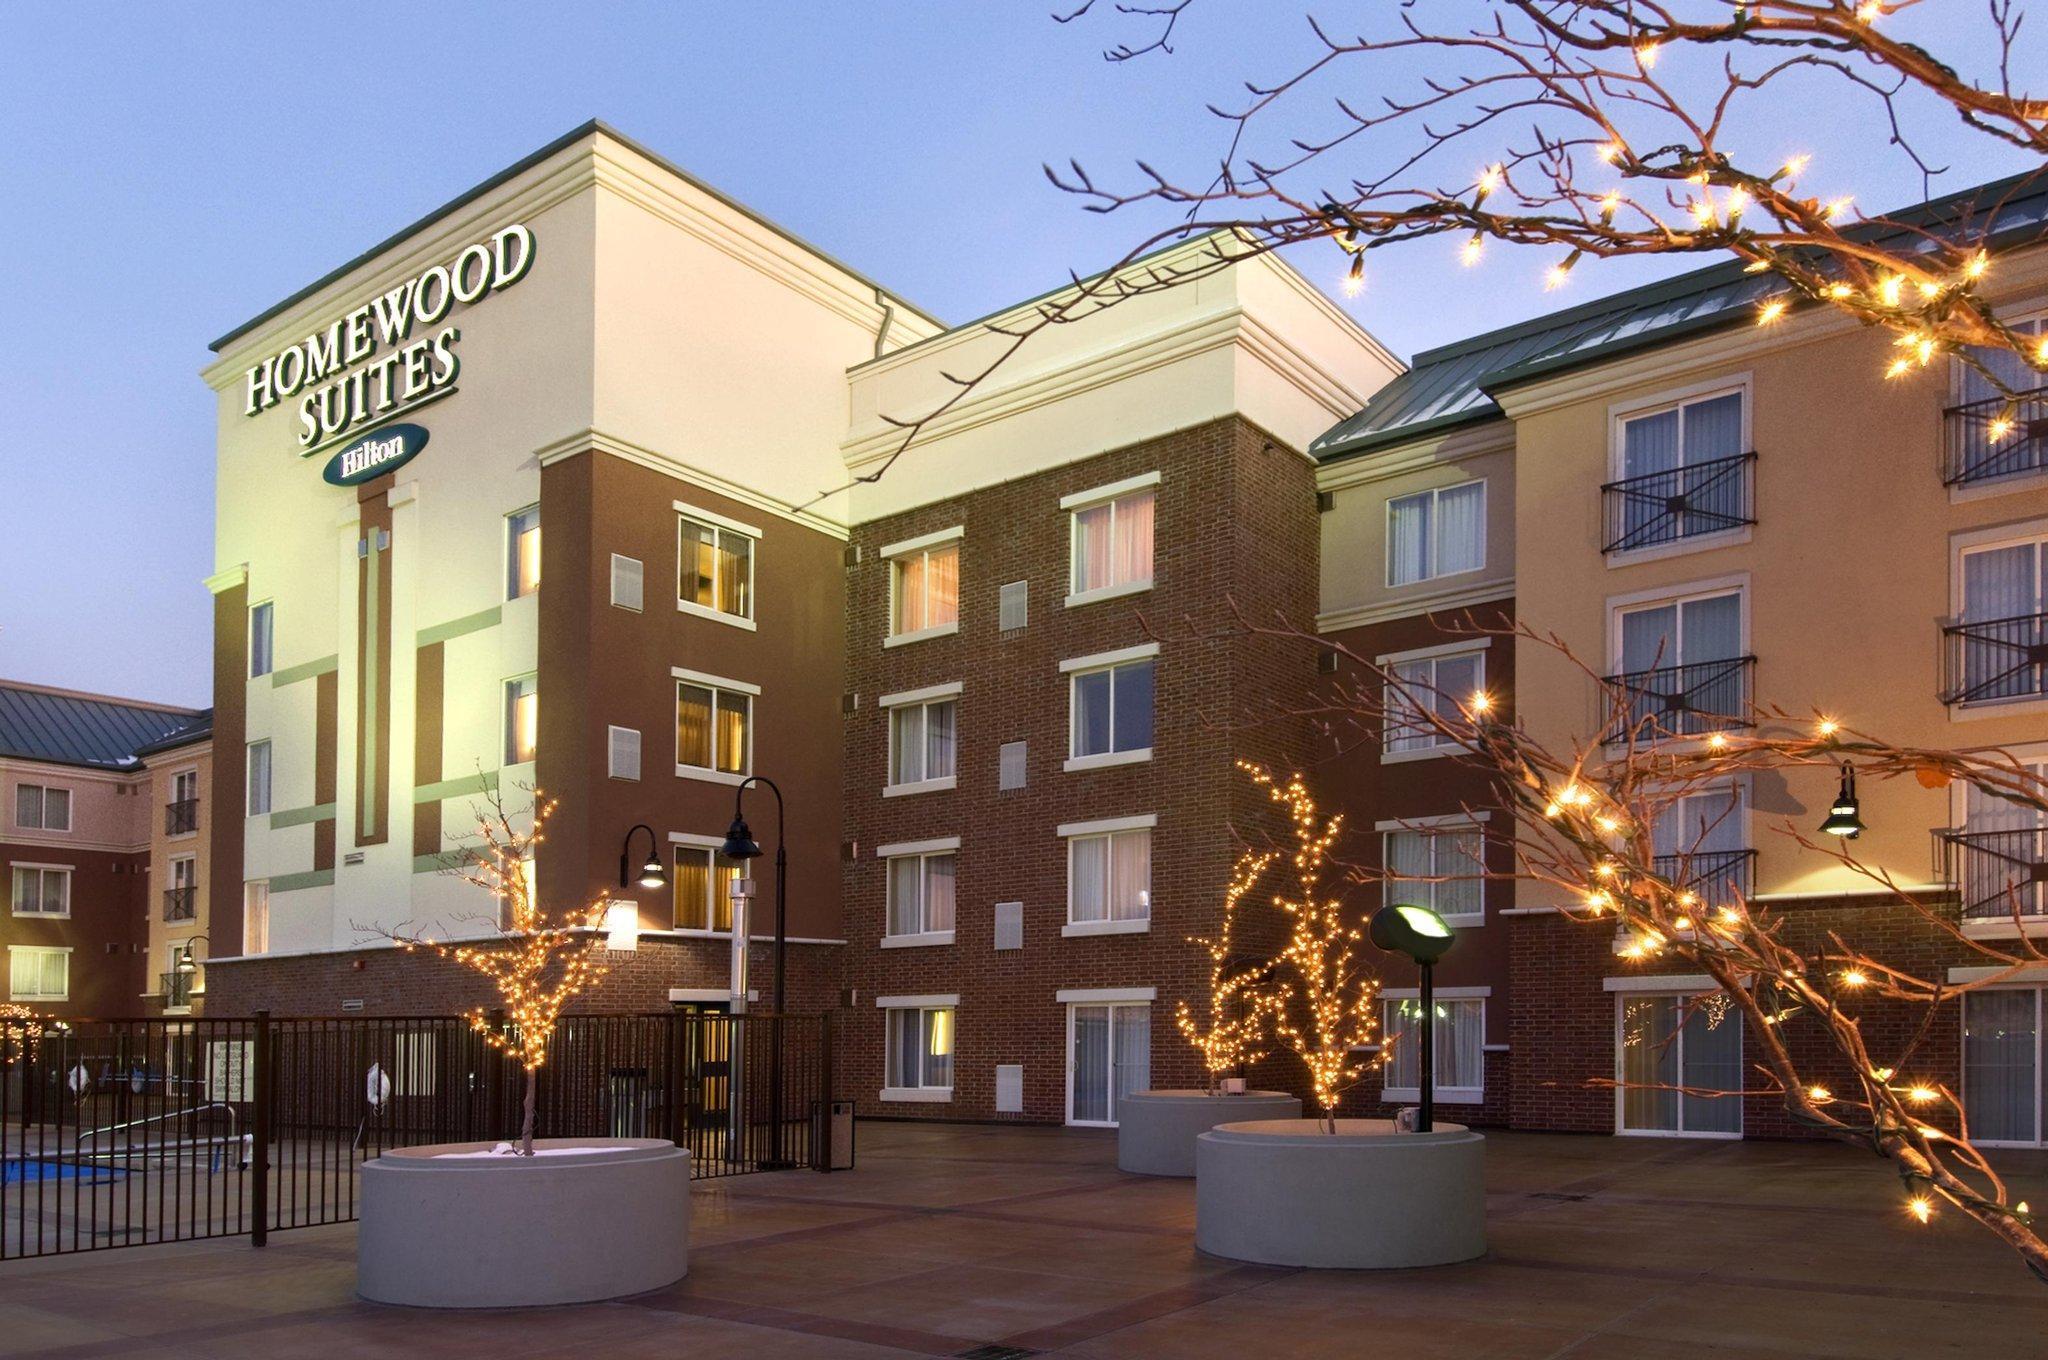 Homewood Suites By Hilton Salt Lake Hotel